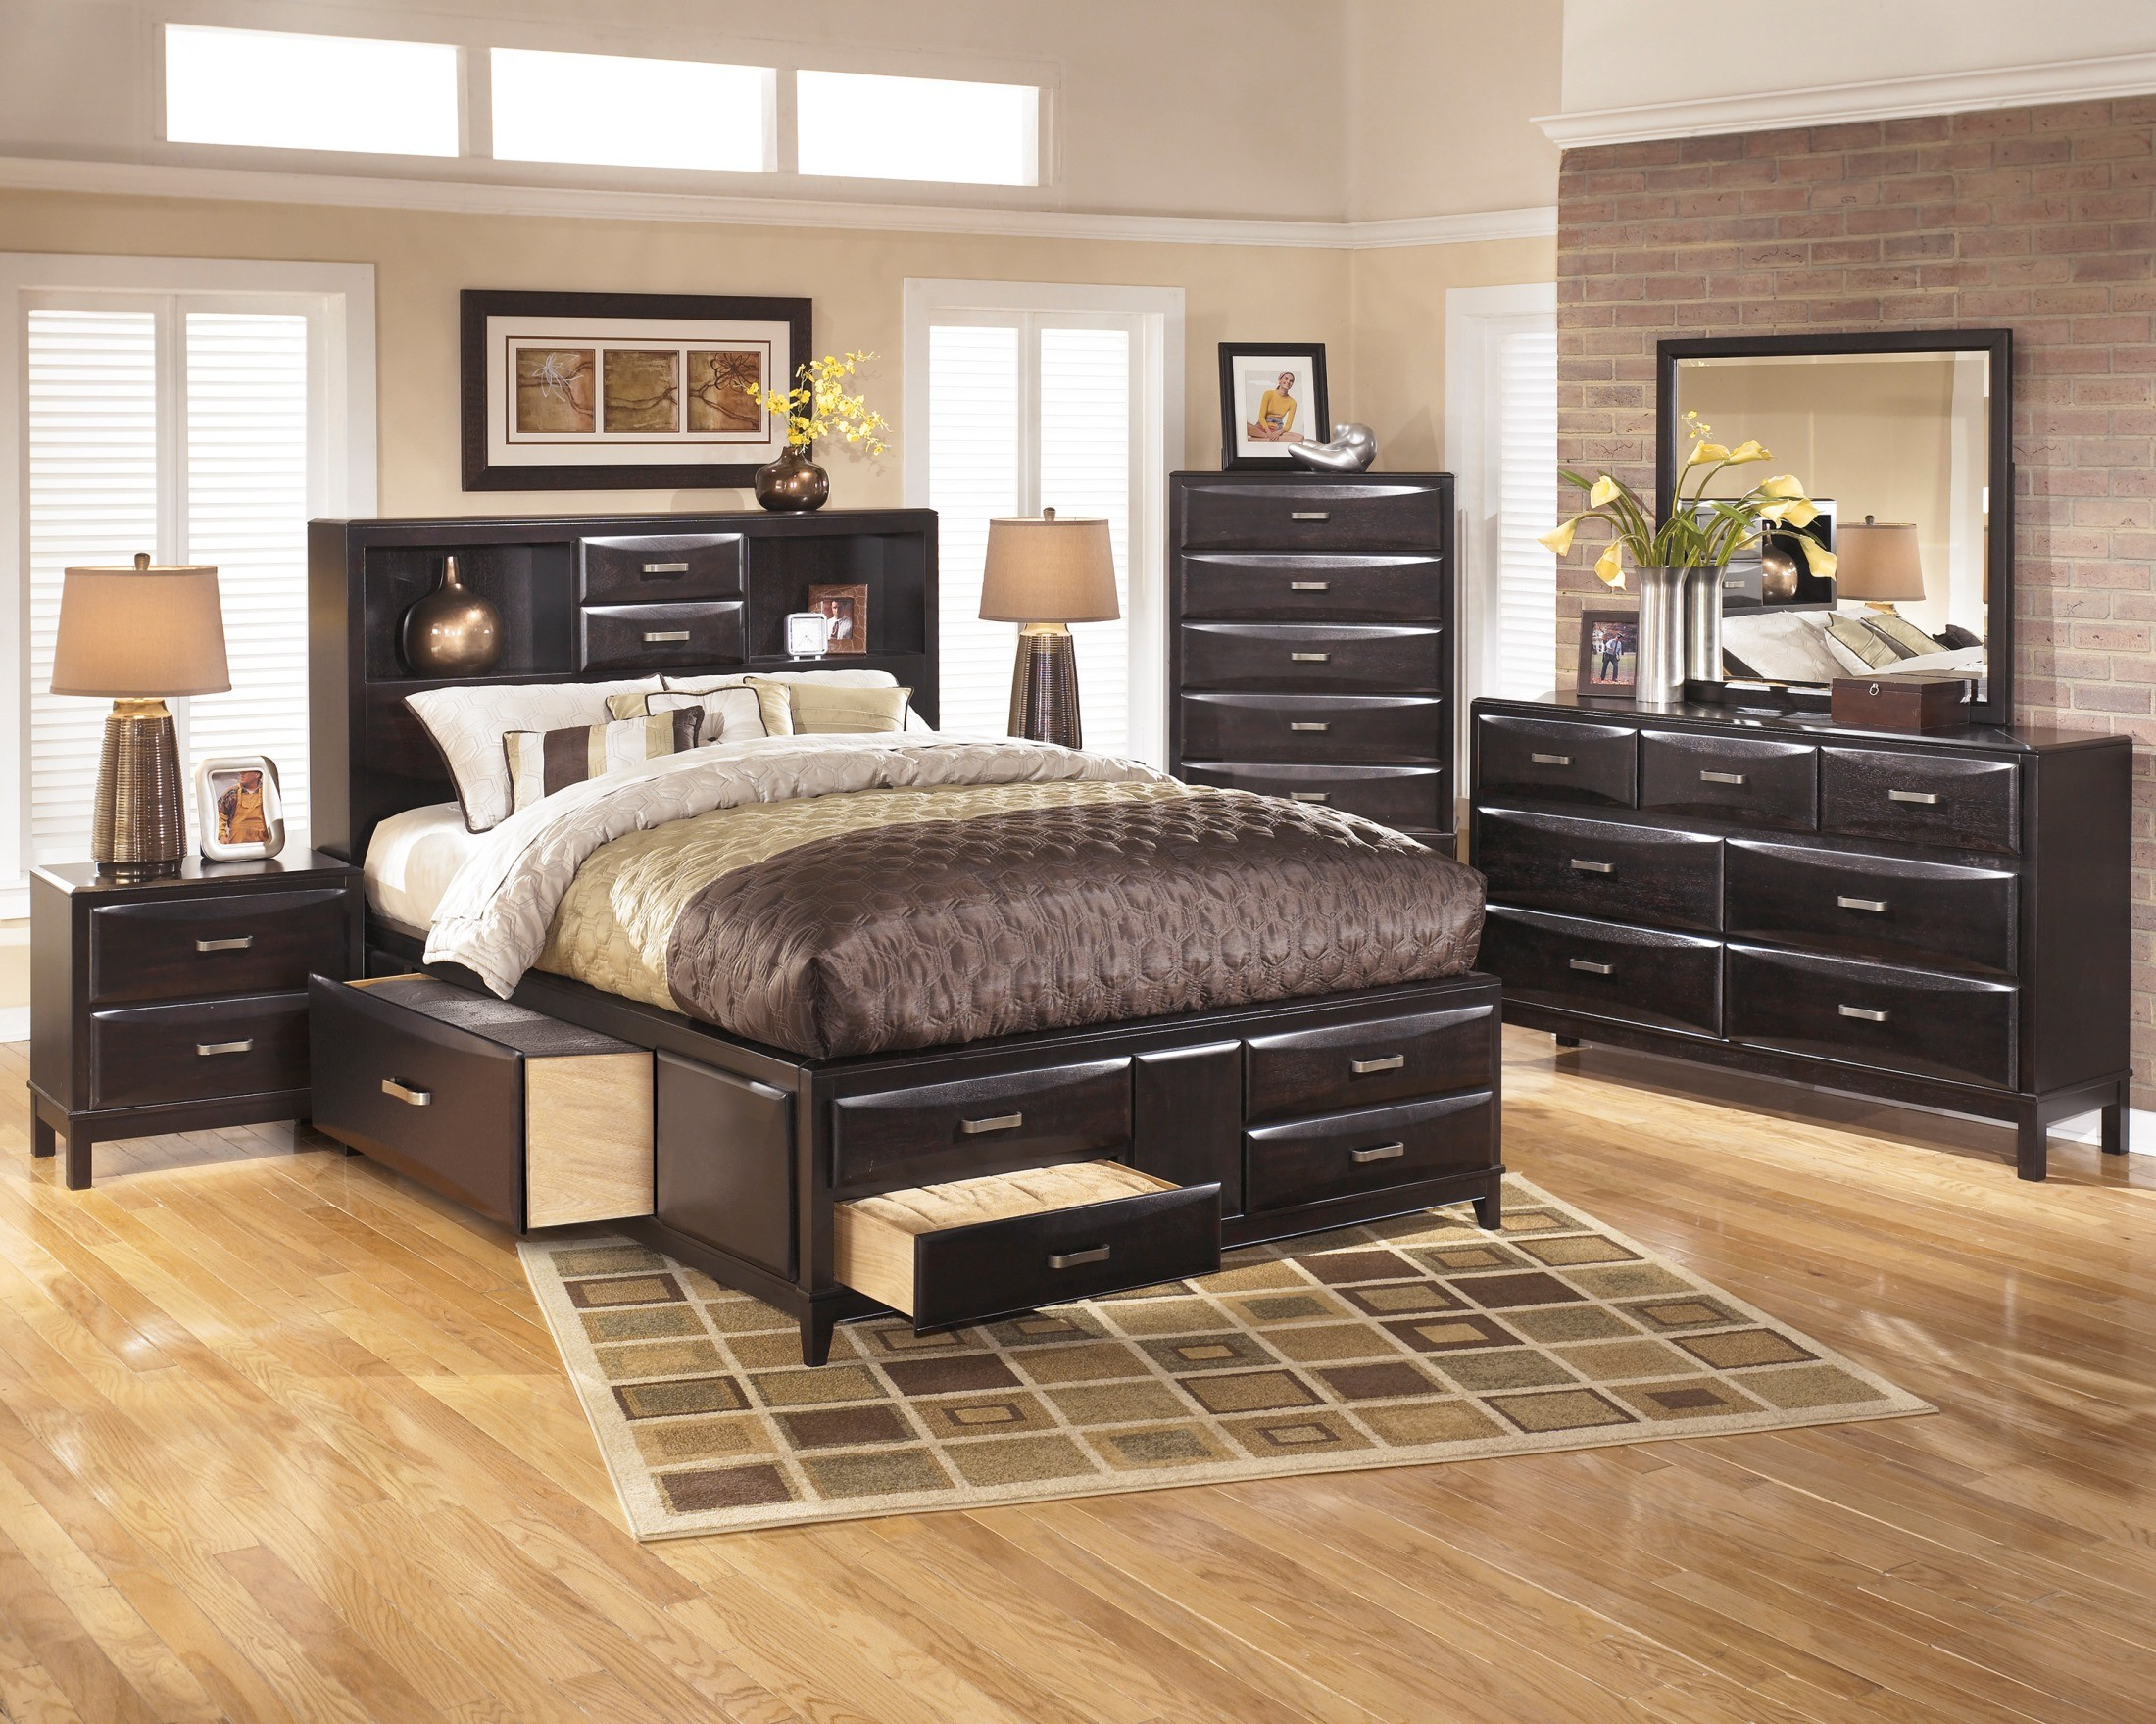 Kira King Storage Bed From Ashley B473 66 69 99